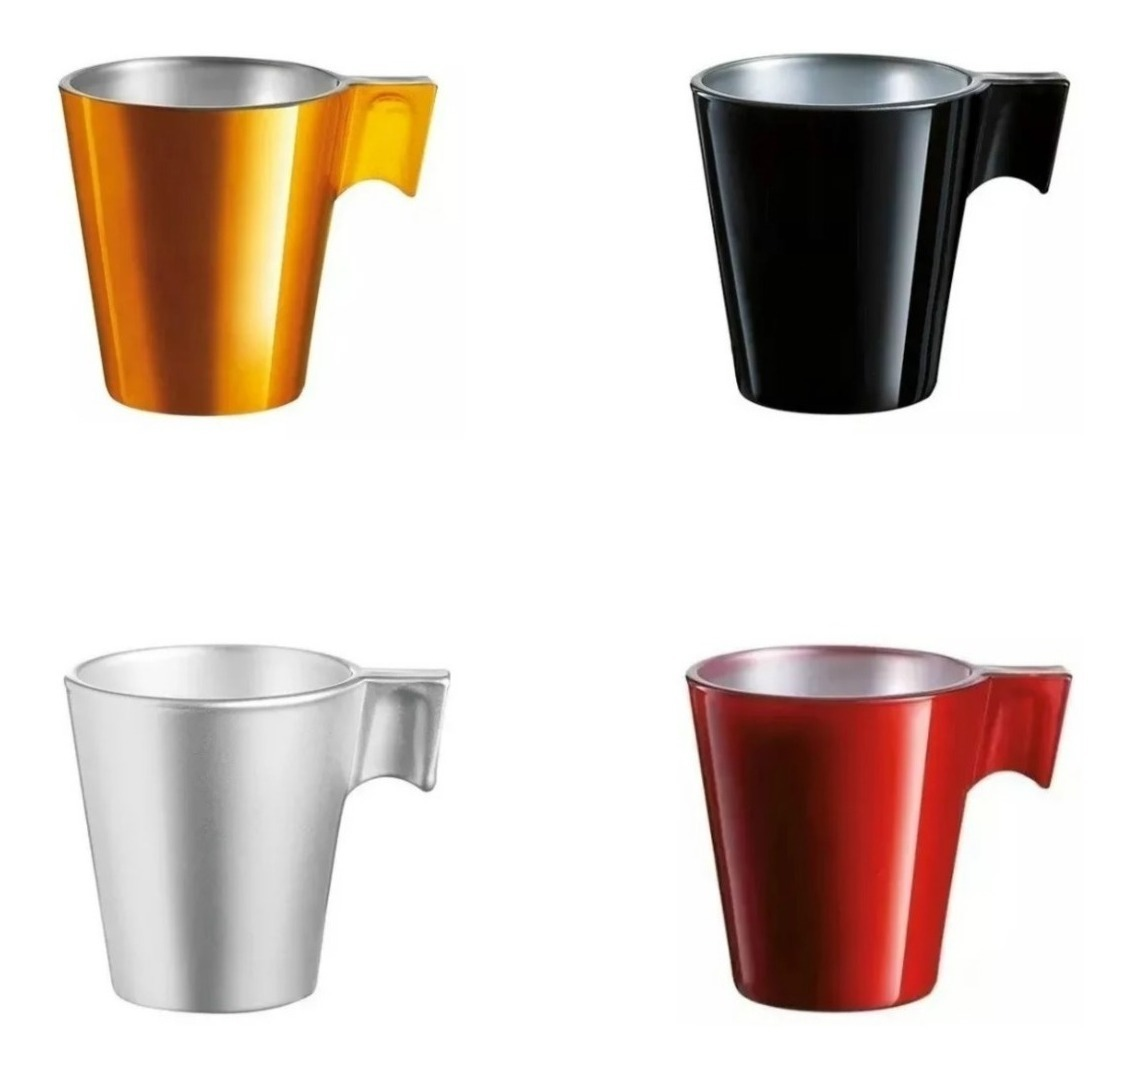 Taza Jarro Cafe Luminarc Flashy Longo 220 Ml Colores Set X4